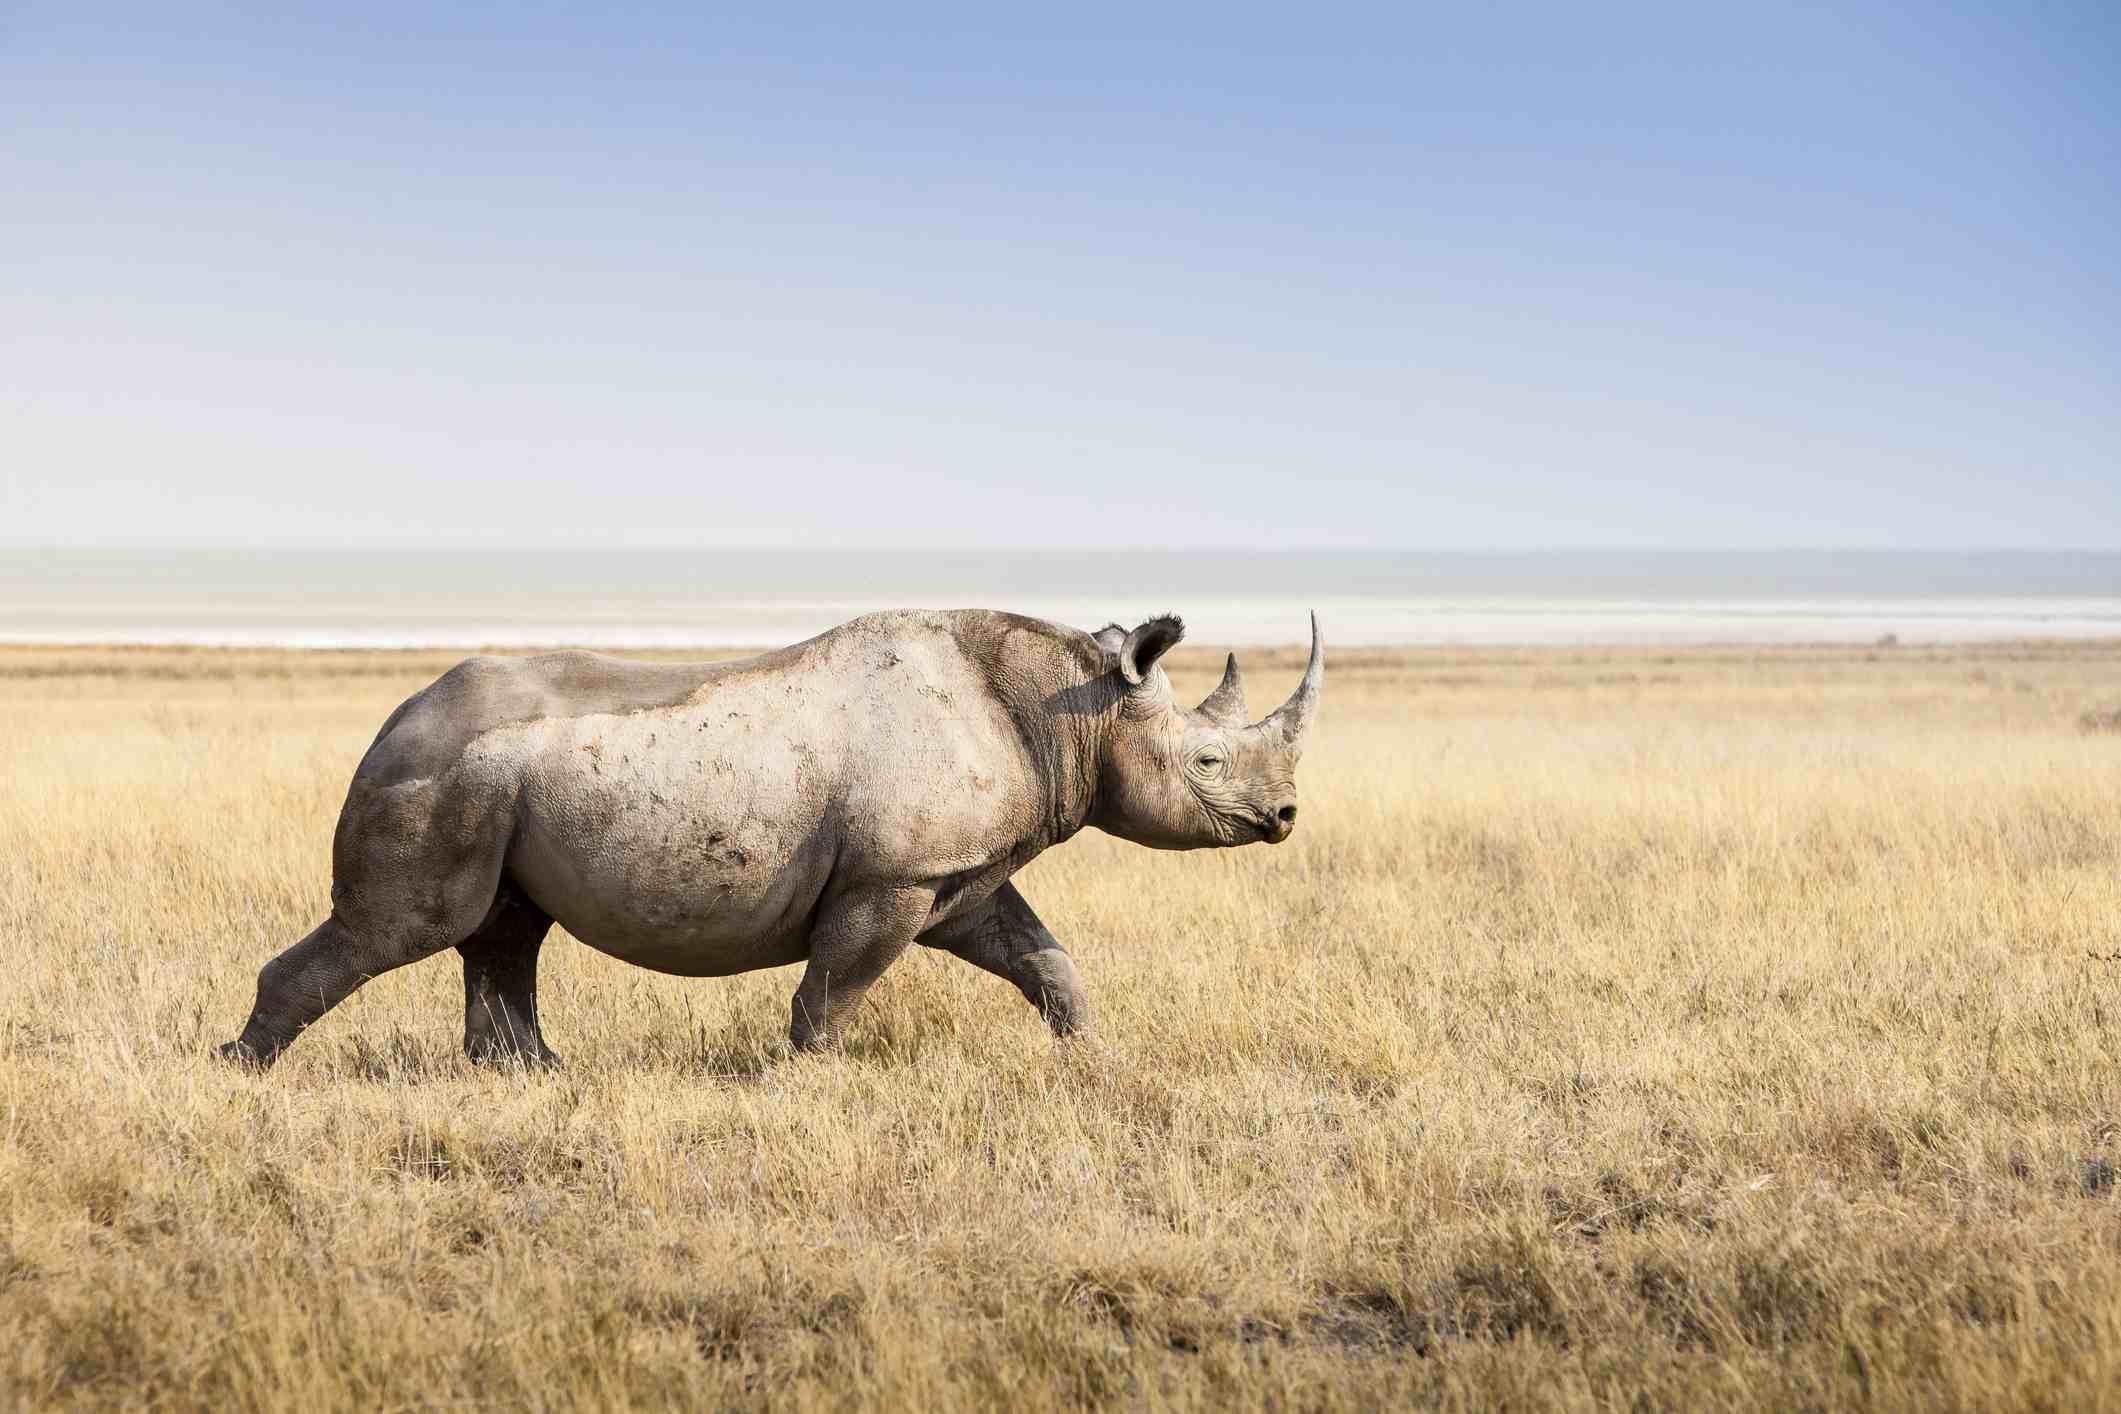 Negro rinoceronte, Parque Nacional de Etosha en Namibia